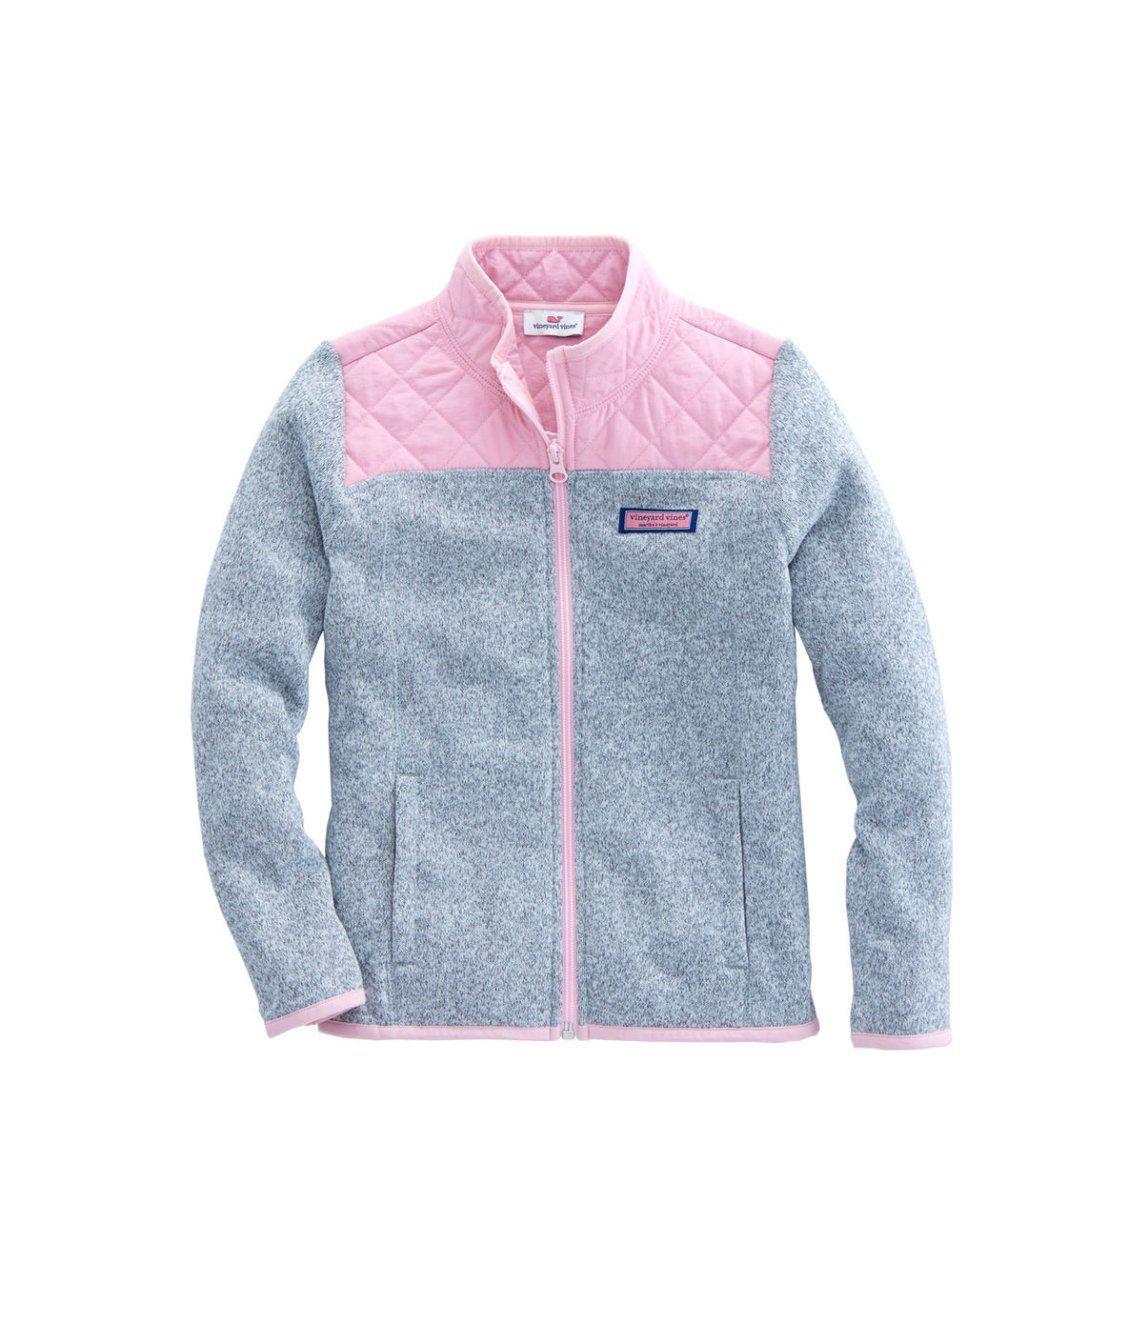 Girls sweater fleece full zip new arrivals pinterest